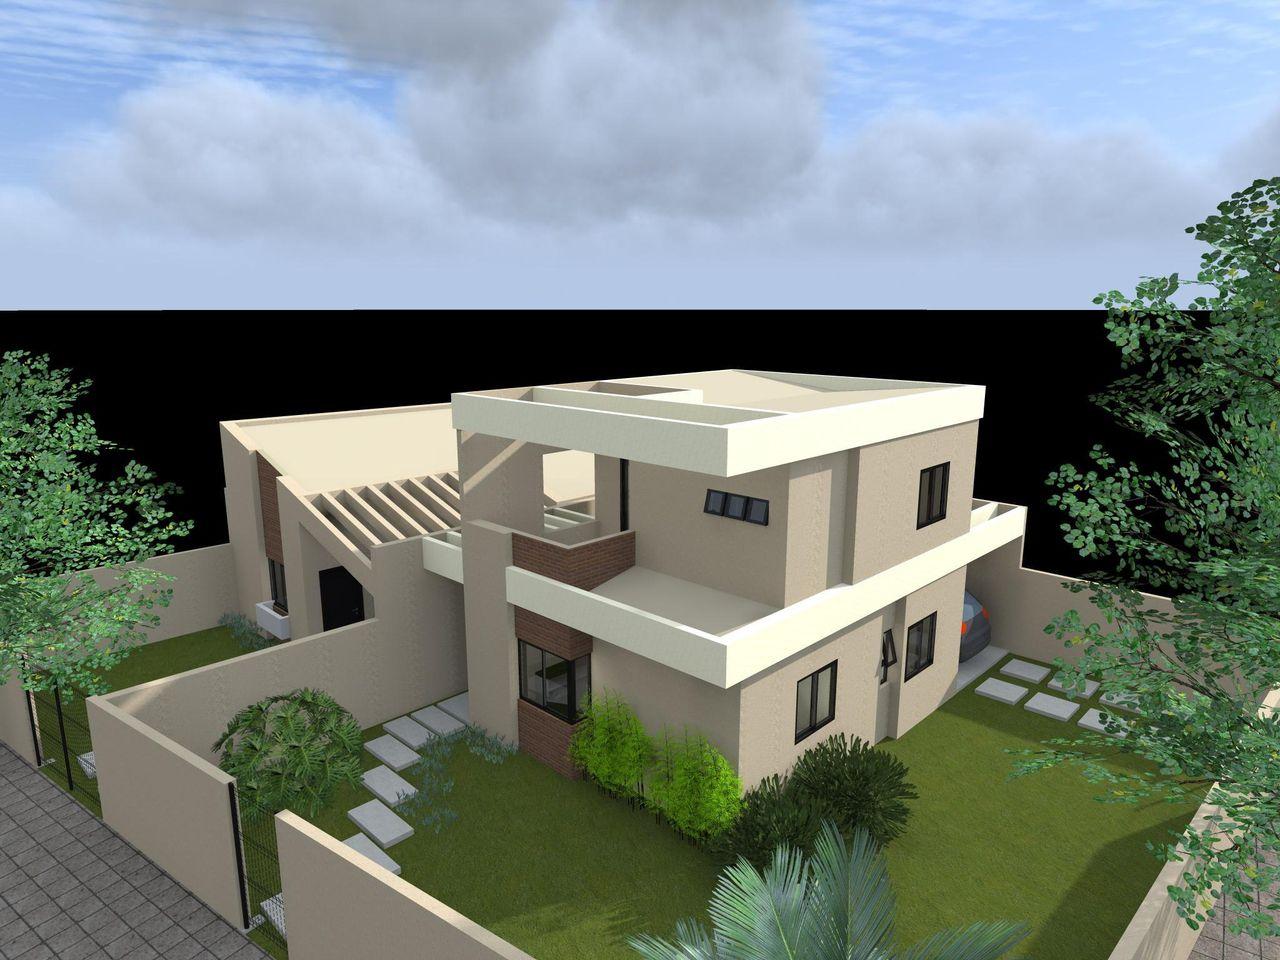 Casas Pequenas De Dois Andares Corredores Externos Casas